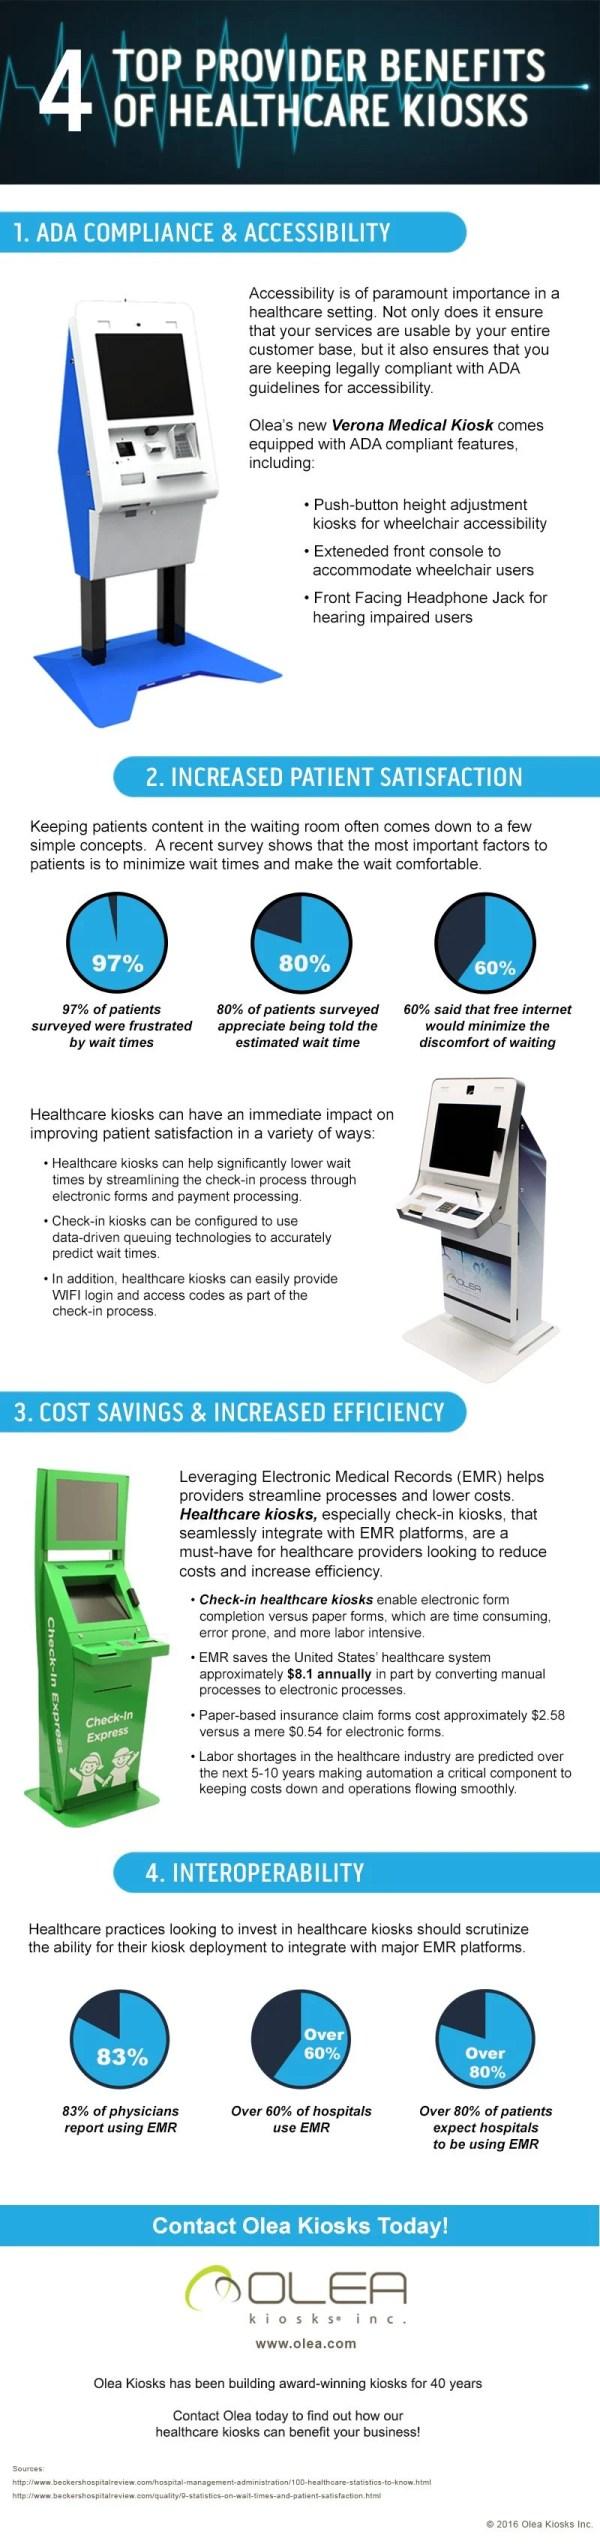 healthcare kiosk benefits